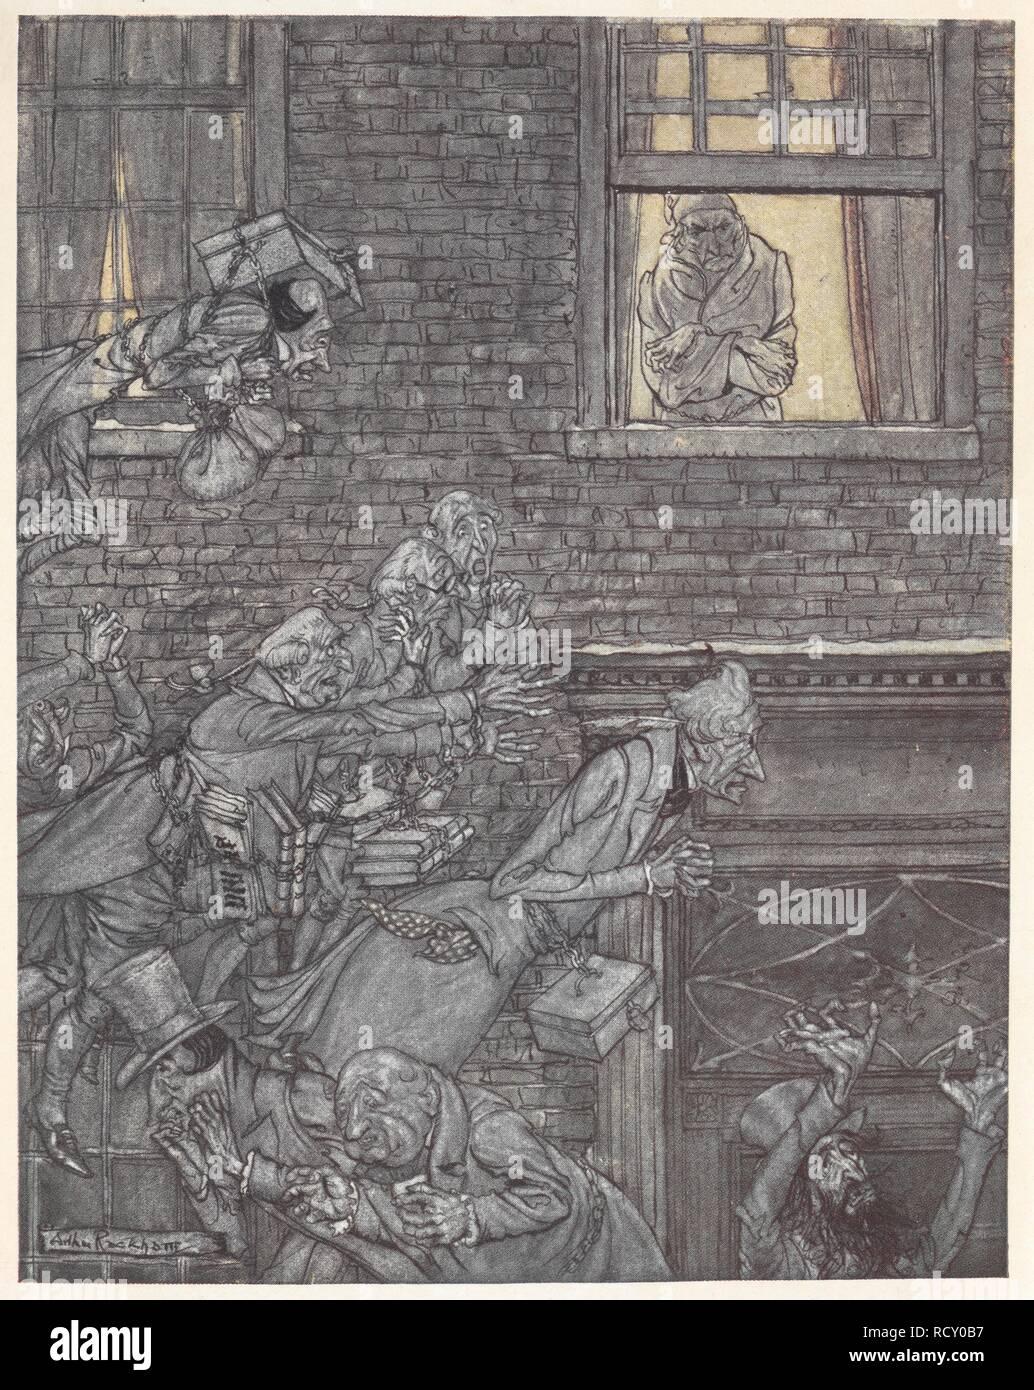 Scrooge At His Window Watching Ghosts In The Street Below A Christmas Carol Illustrated By Arthur Rackham London J B Lippincott Co Philadelphia Wiiliam Heinemann 1915 The Air Was Filled